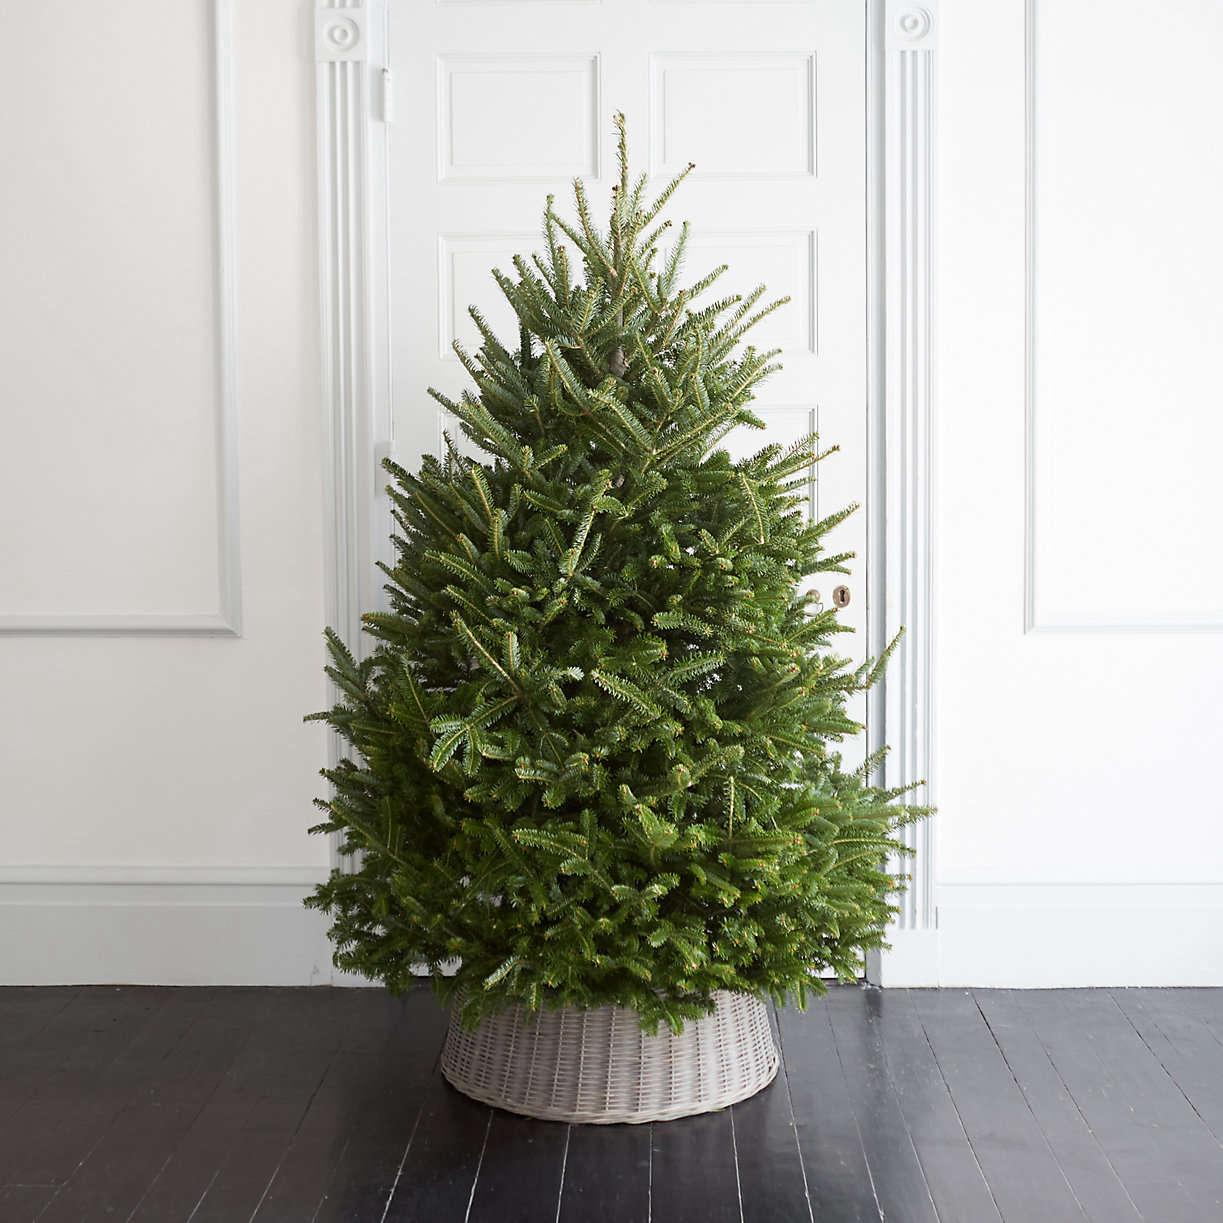 fresh-cut-fraser-fir-christmas-tree-from-terrain